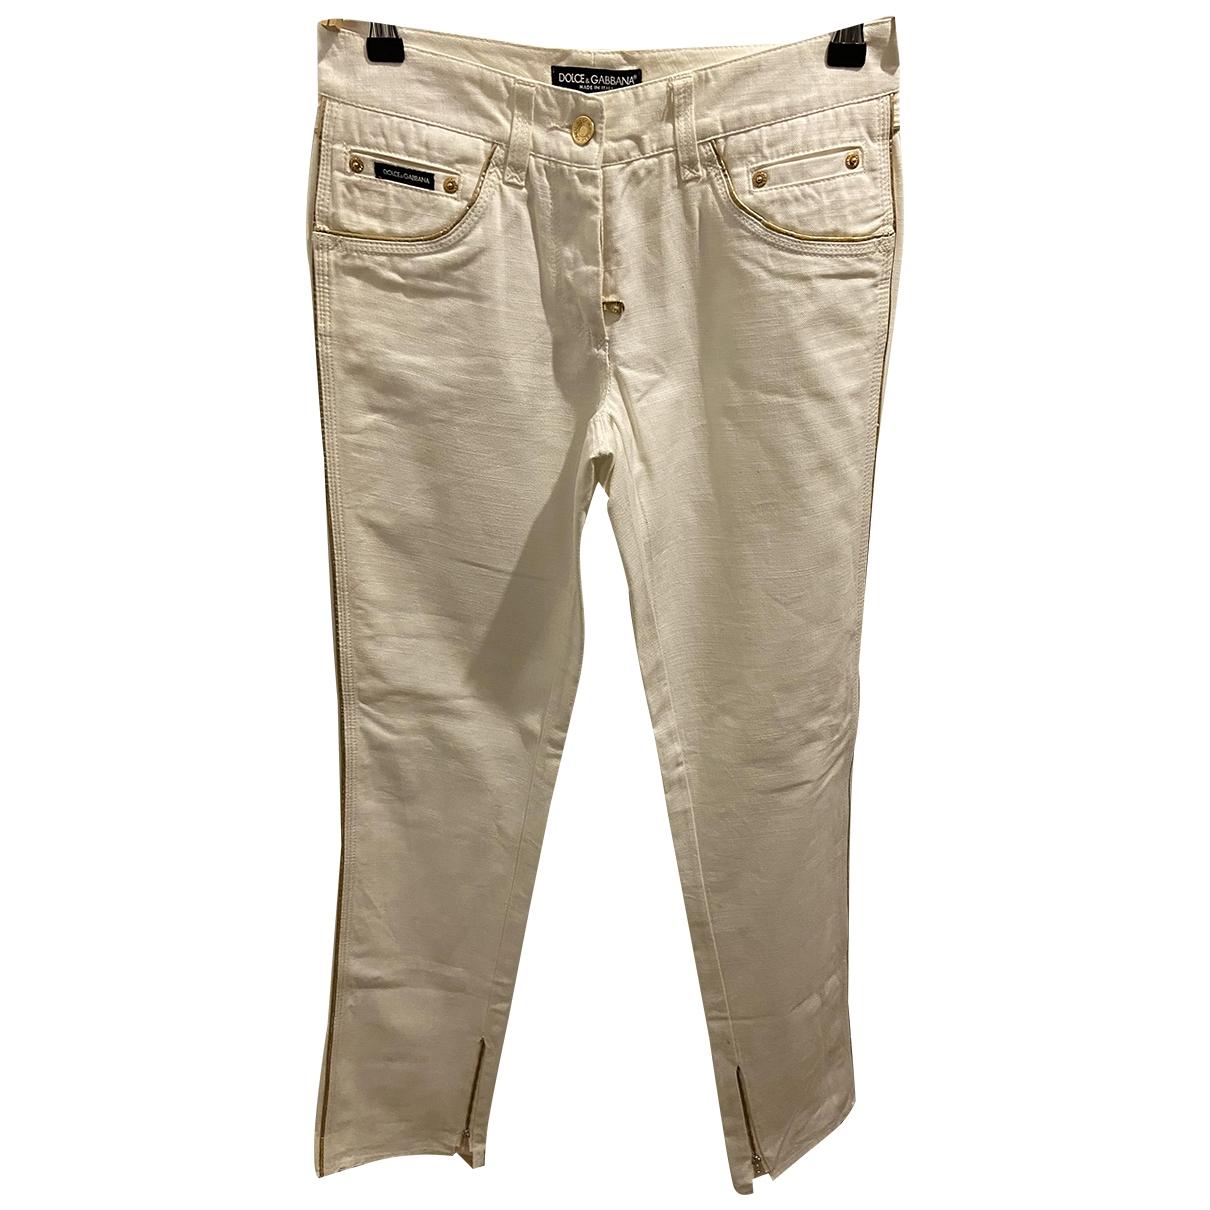 Dolce & Gabbana \N Ecru Cotton Trousers for Women 38 IT